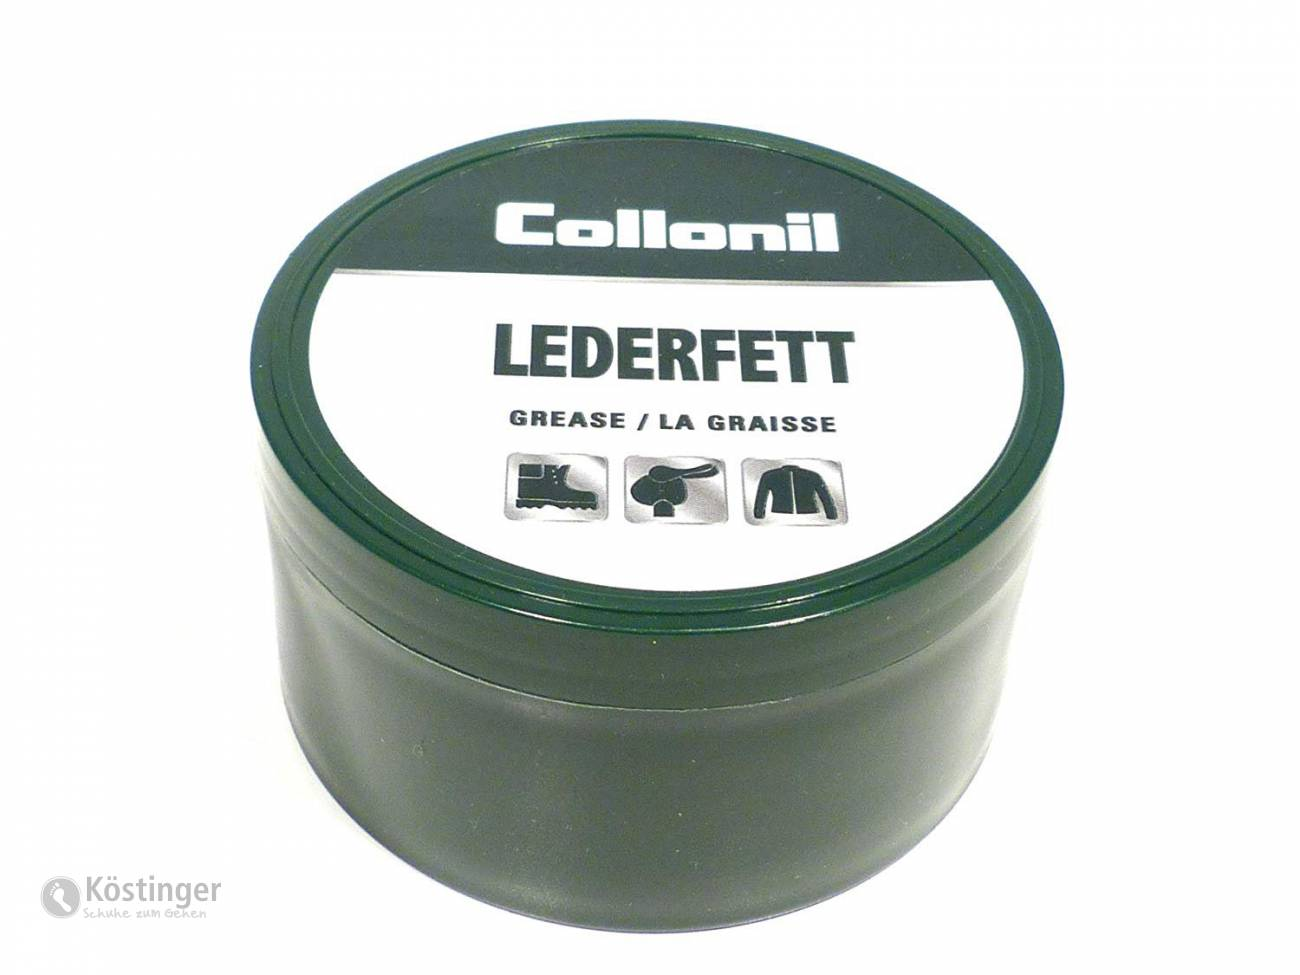 Collonil Lederfett - 7118